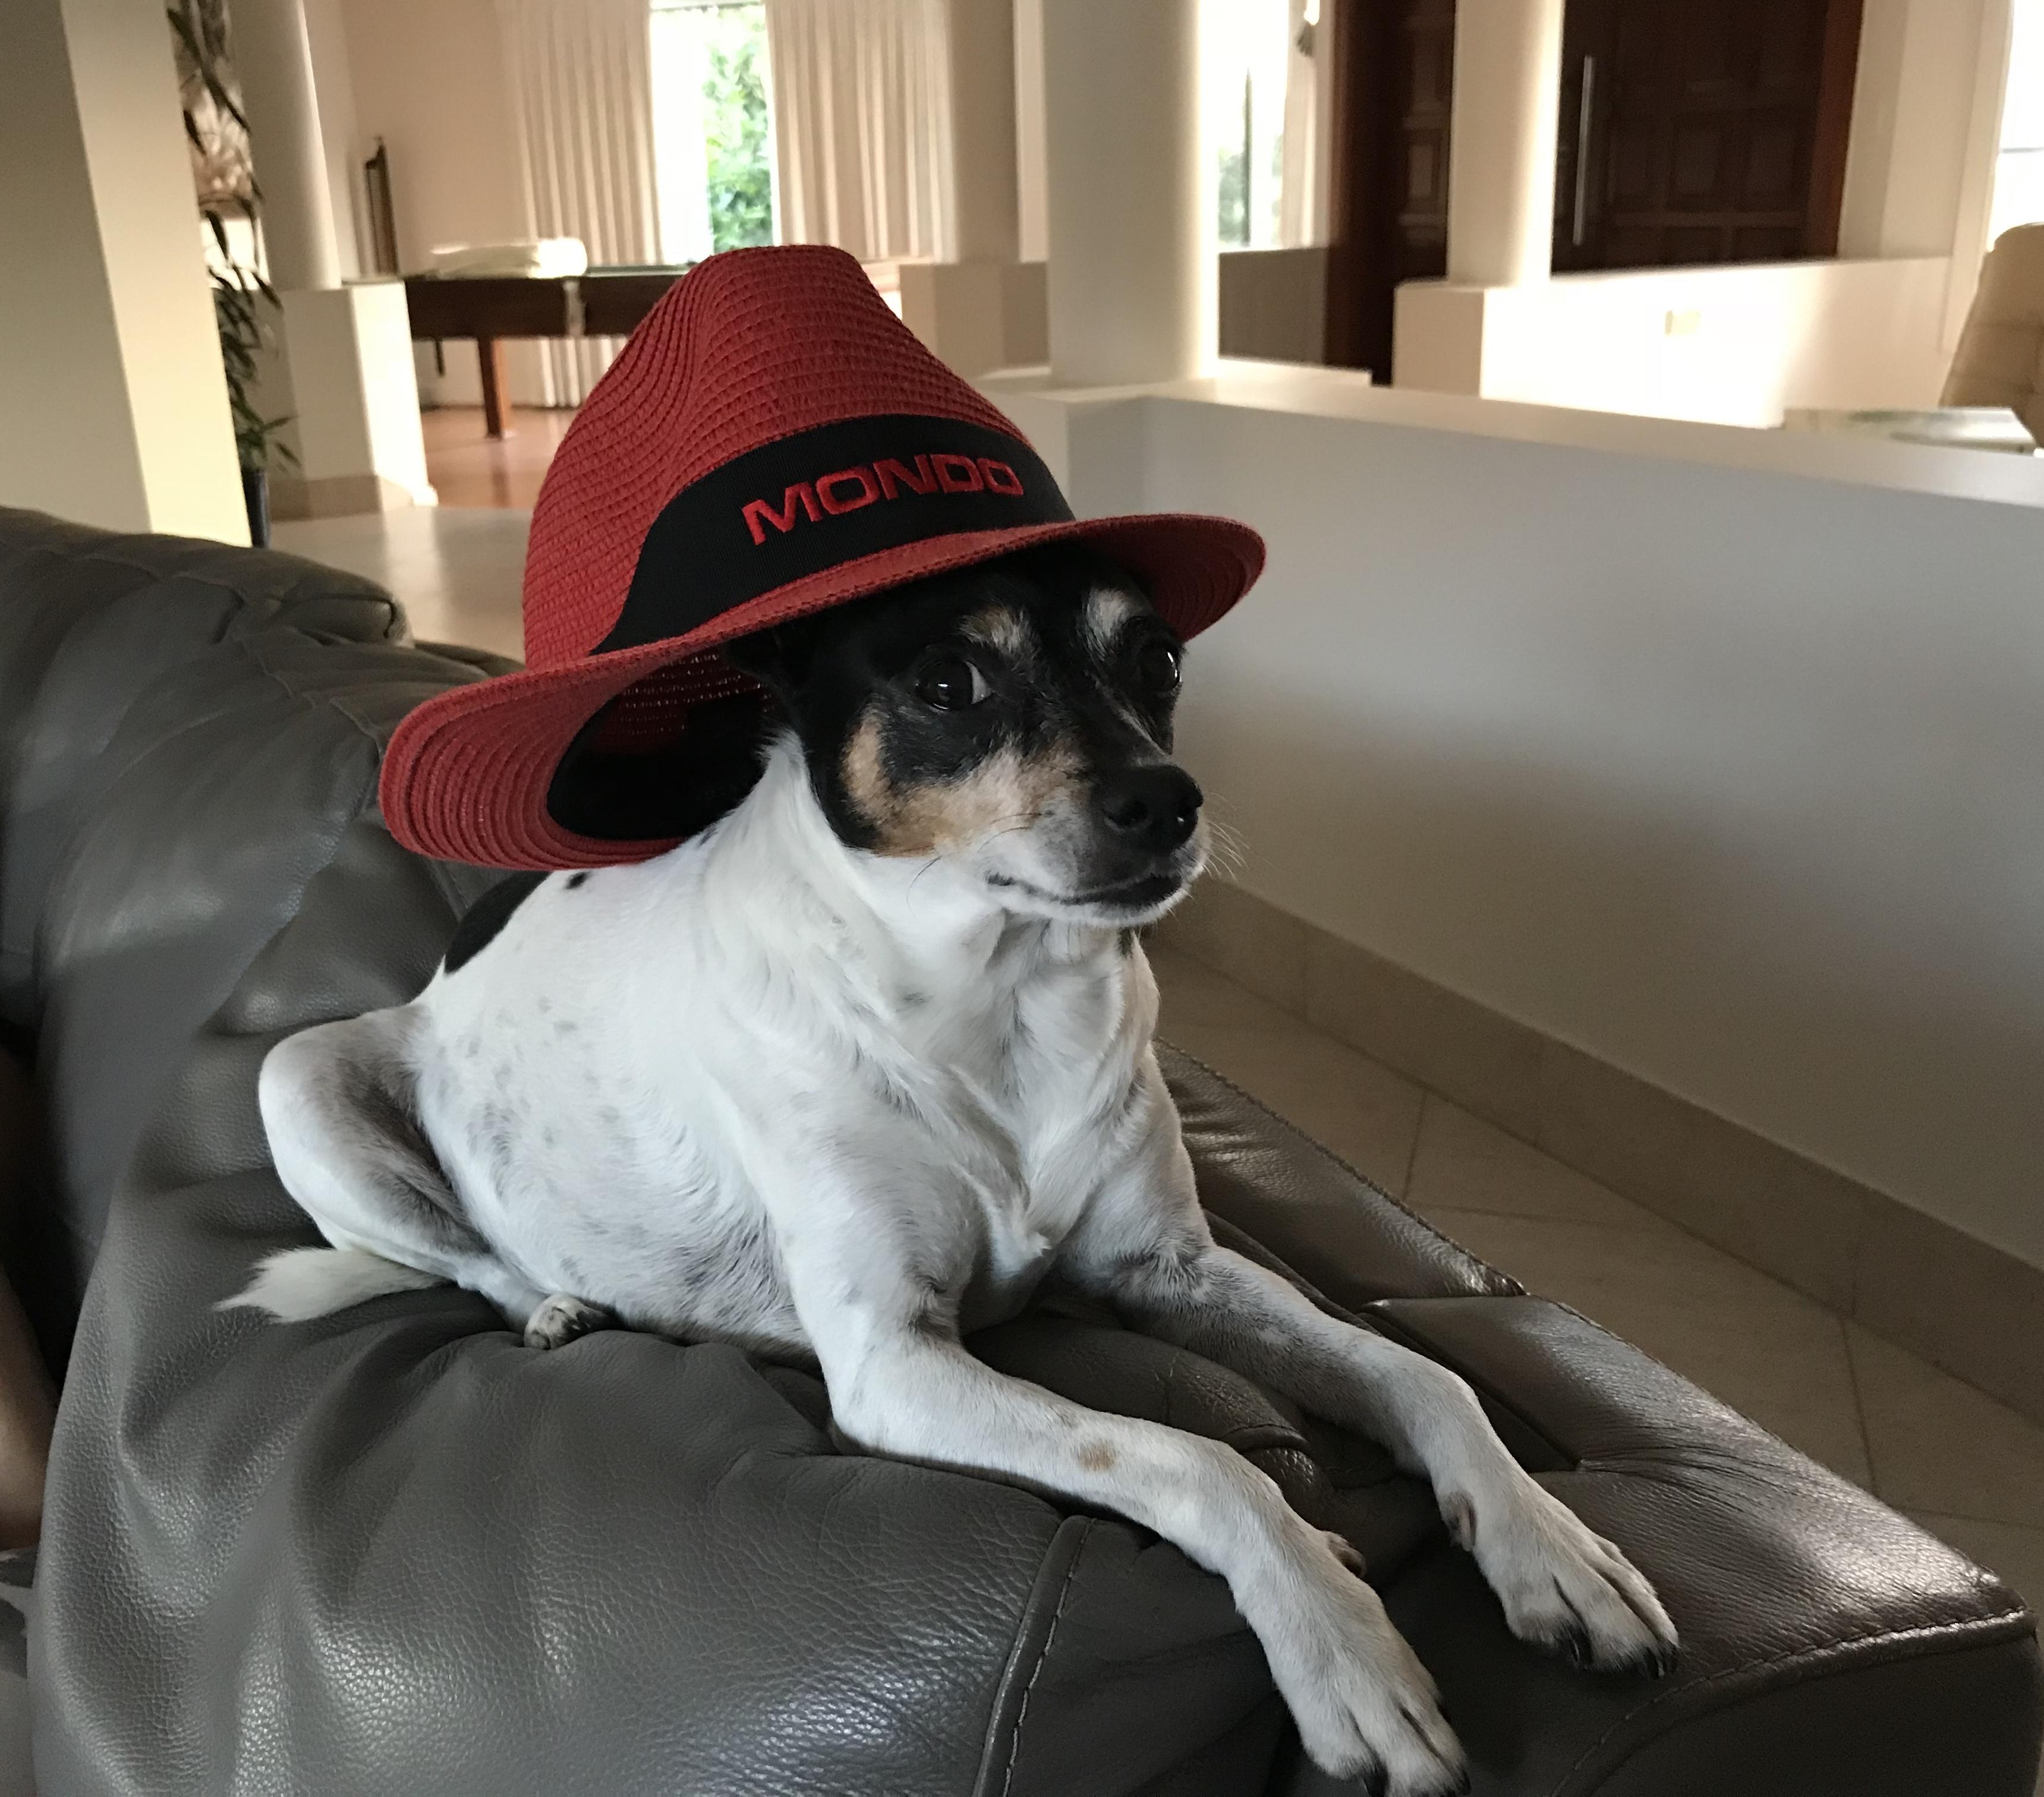 Bella loving the Mondo hat